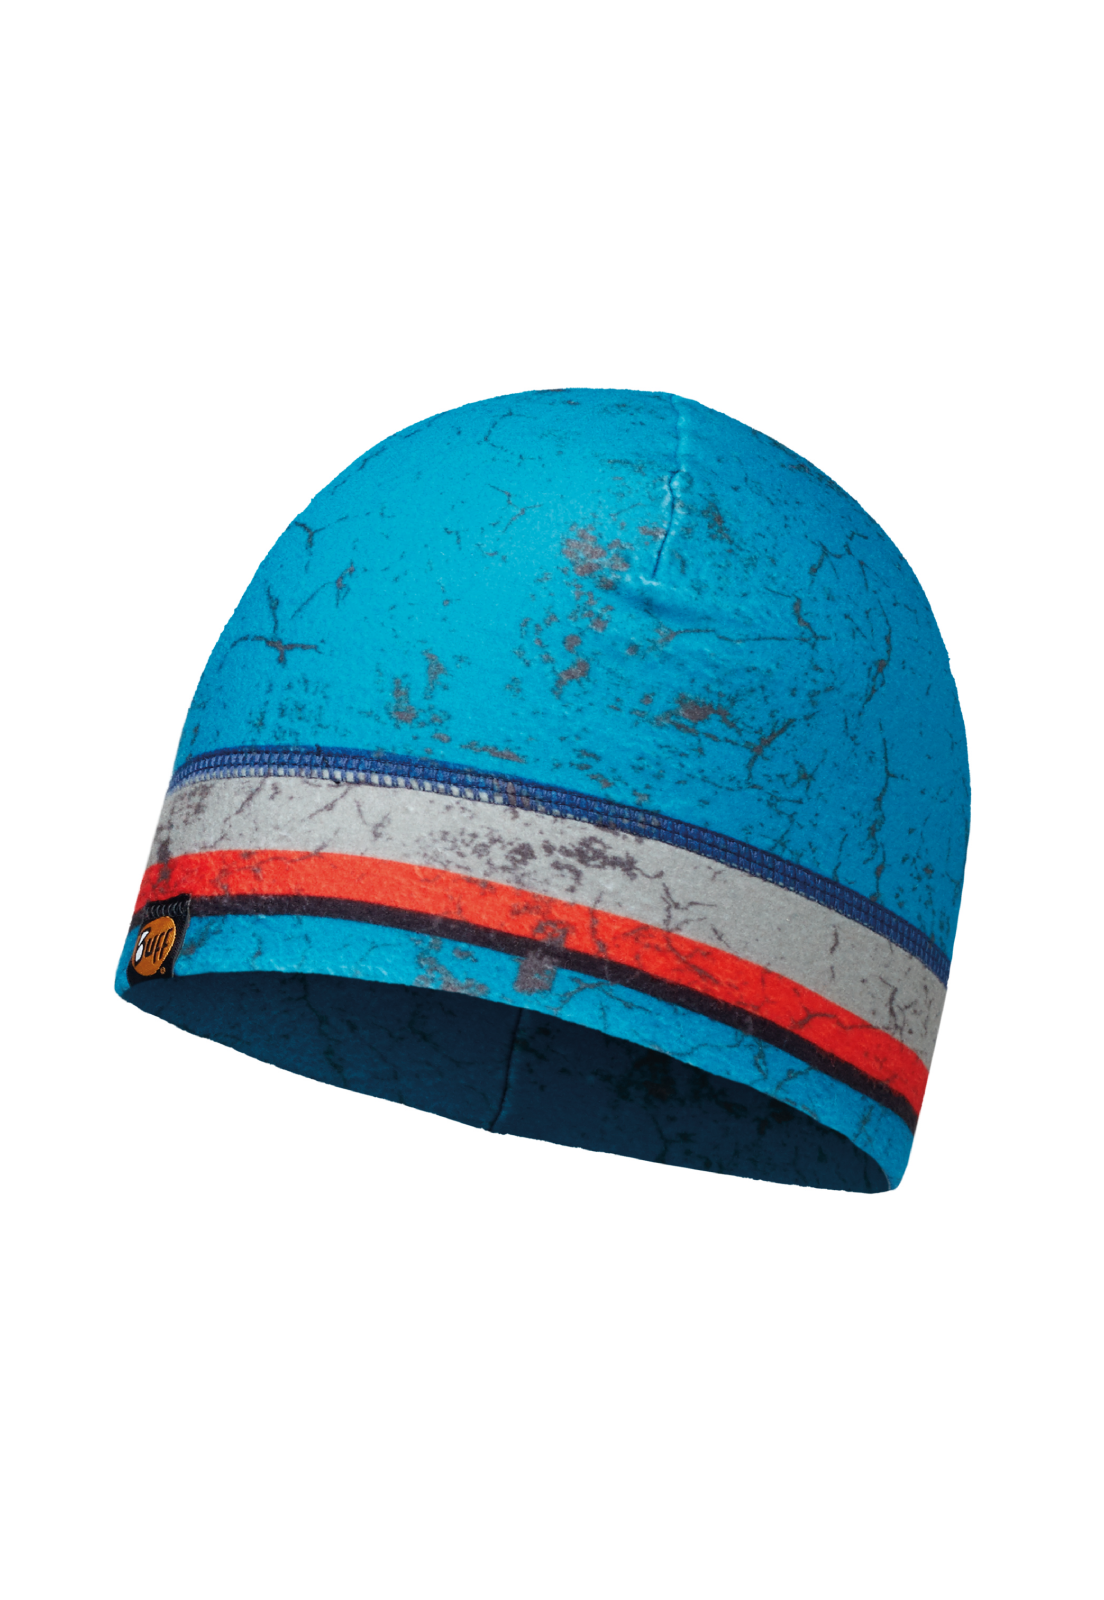 Kids Polar Hat Dash Multi